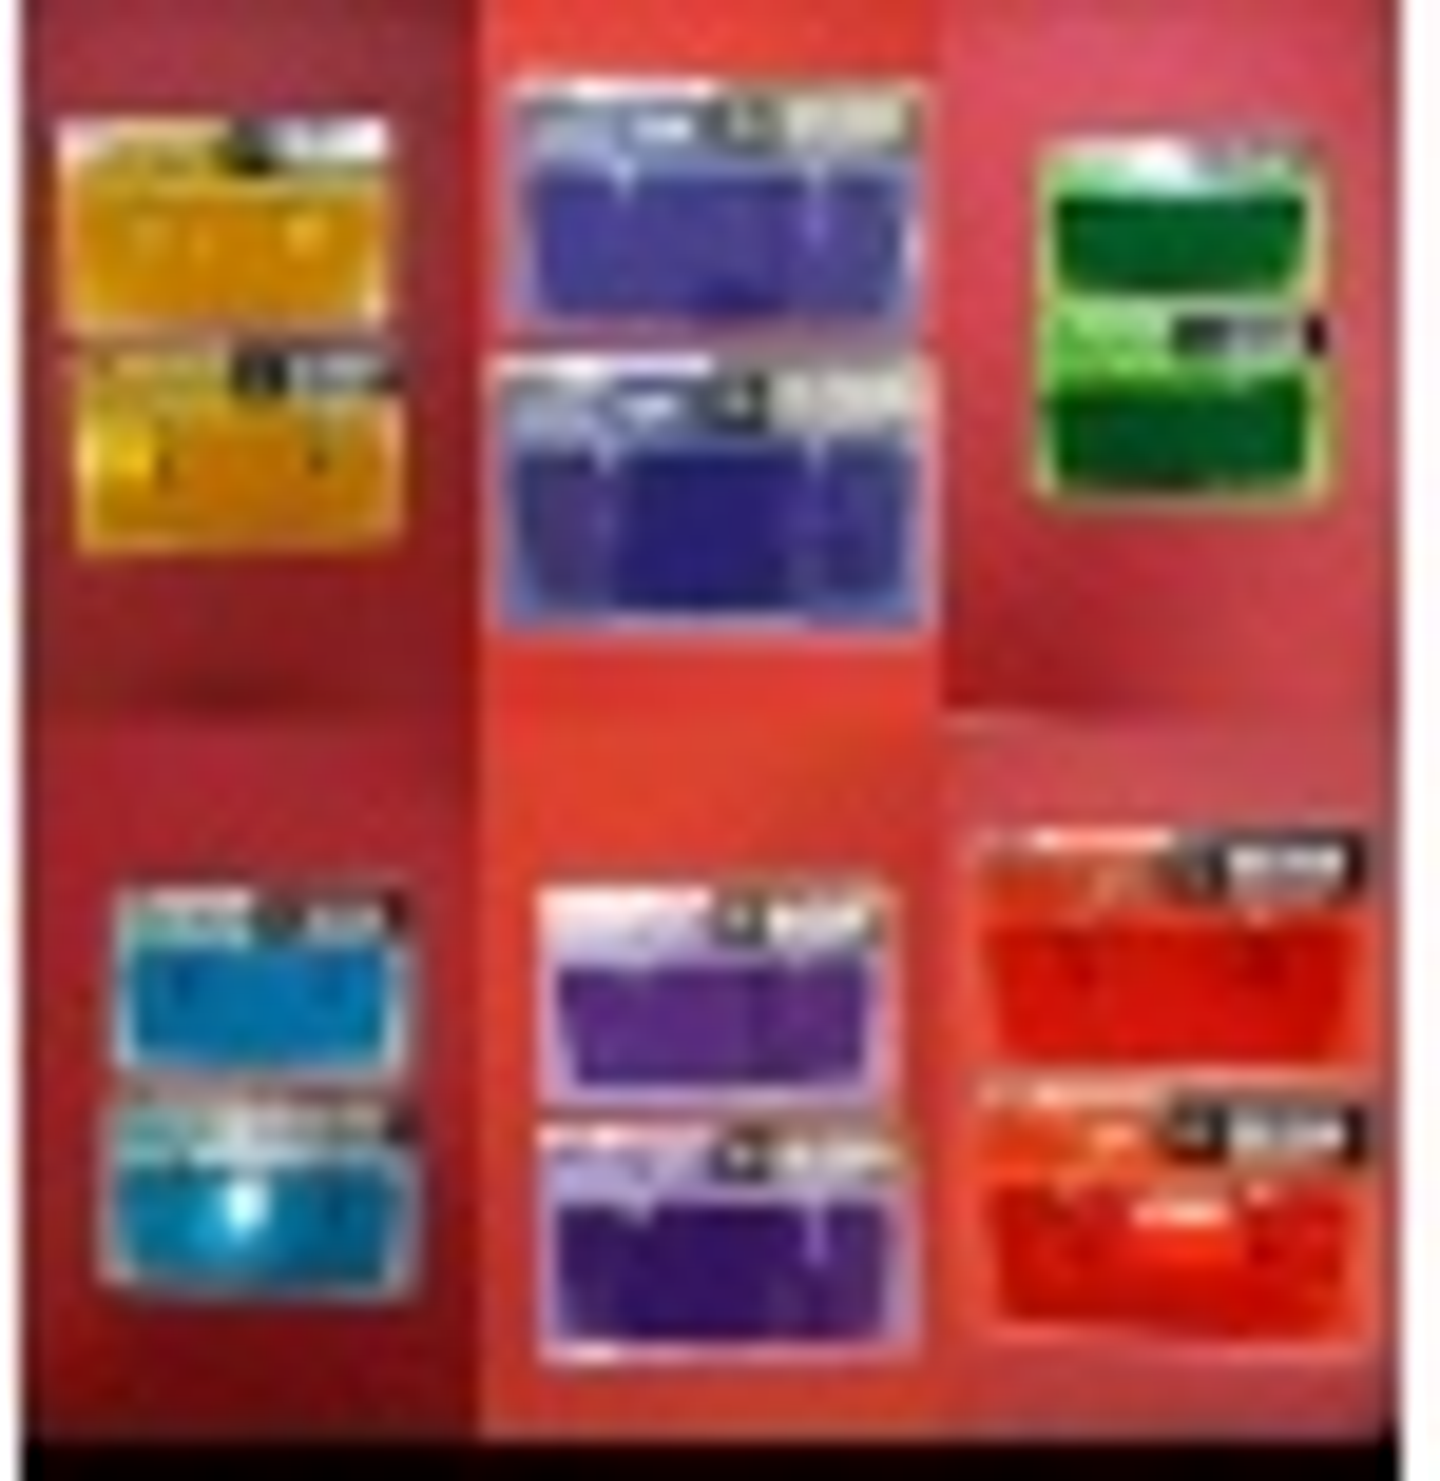 Oto Renkli Güneşlik Etiket visor visör